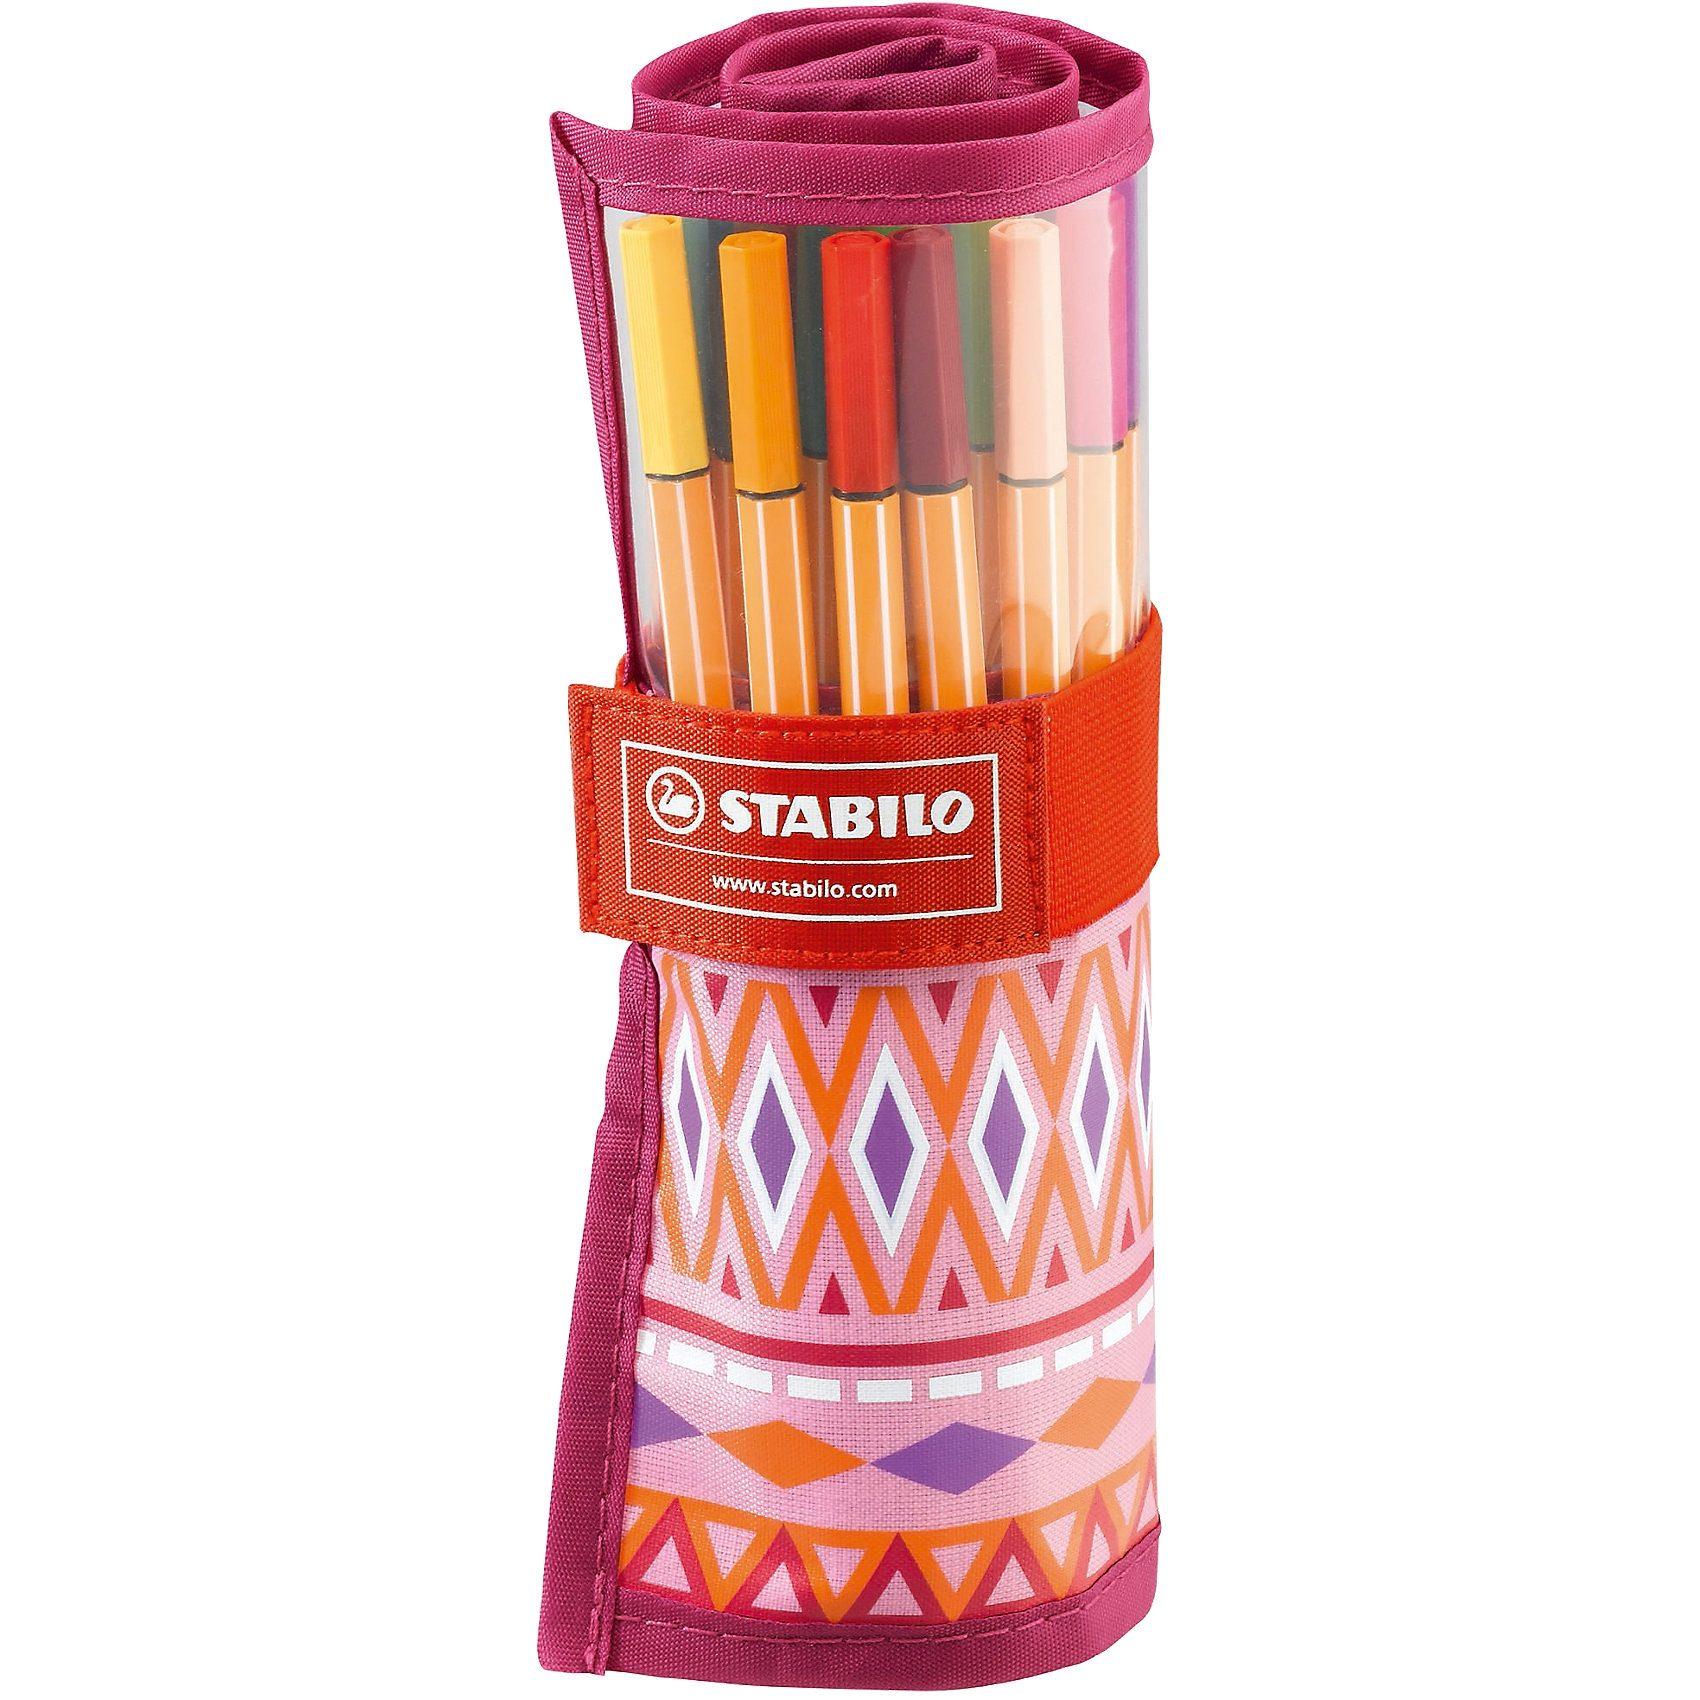 Stabilo Fineliner point 88 im Rollerset Festival Spirit pink, 25 Far